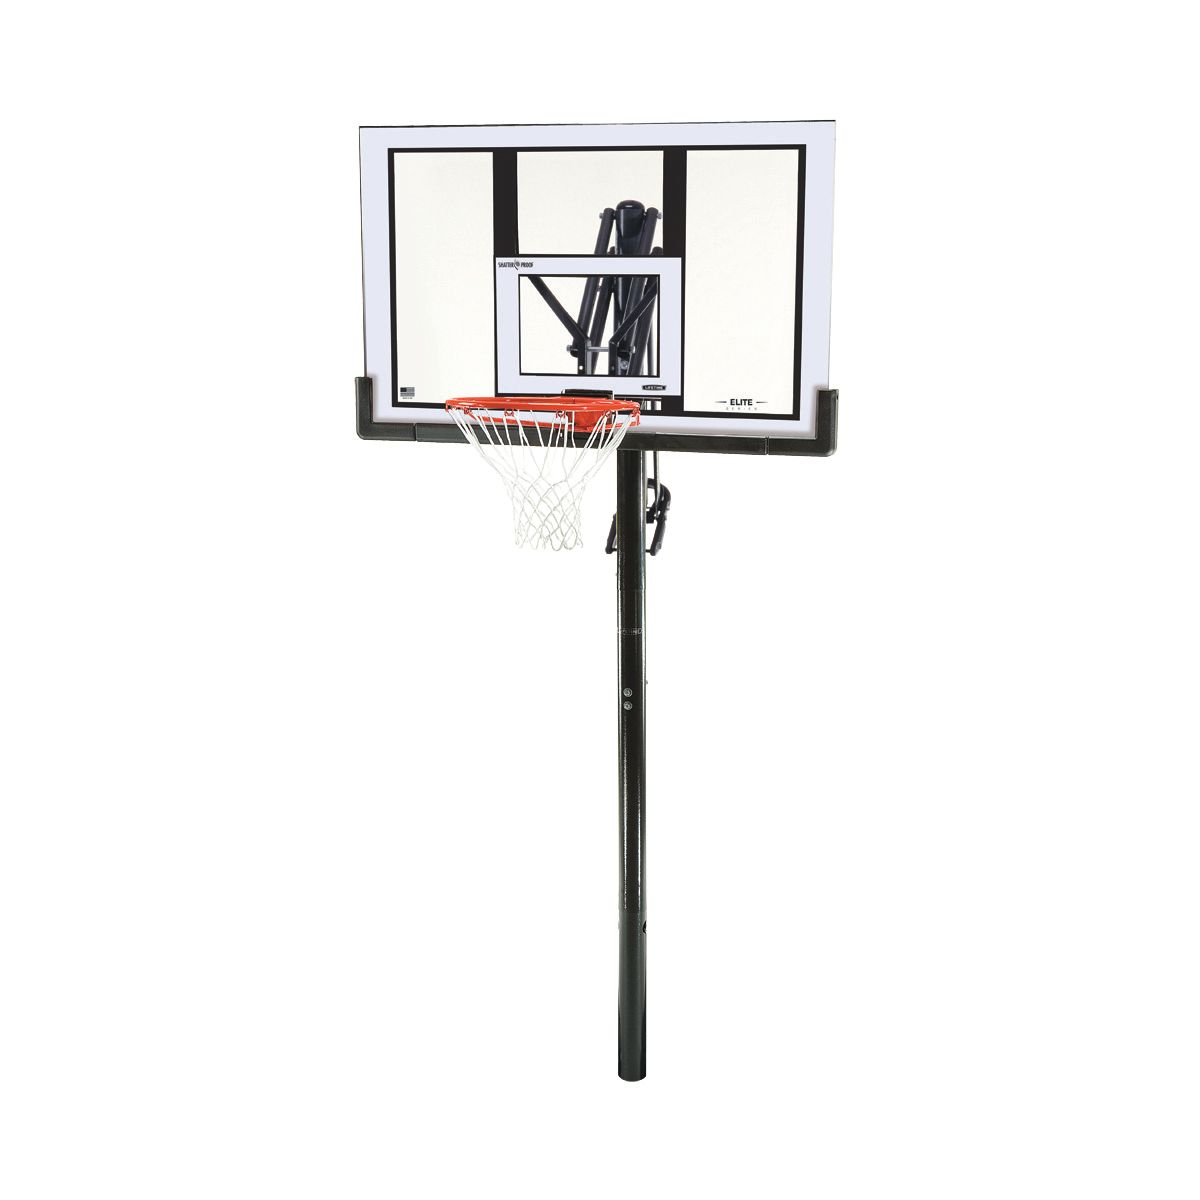 "Fresh Lifetime Elite 52"" In-Ground Basketball Hoop | DICK'S Sporting Goods BL33"